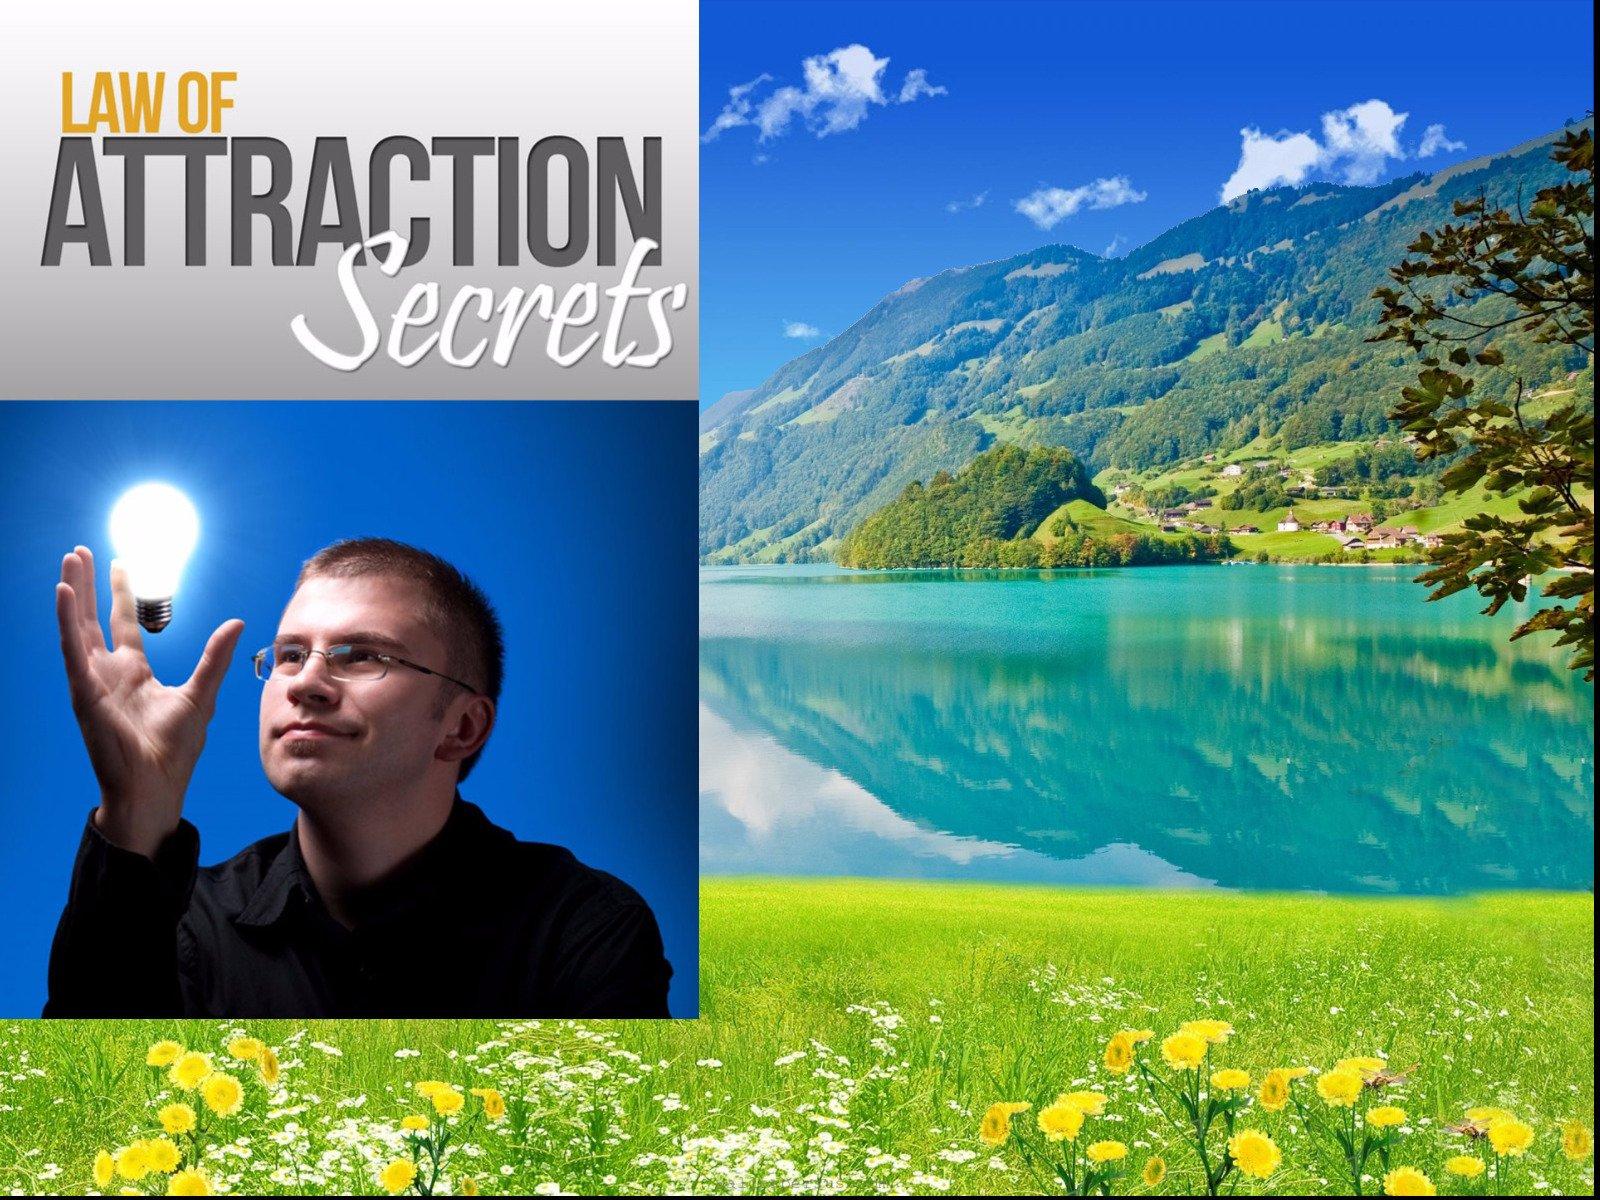 Law of Attraction Secrets. - Season 1